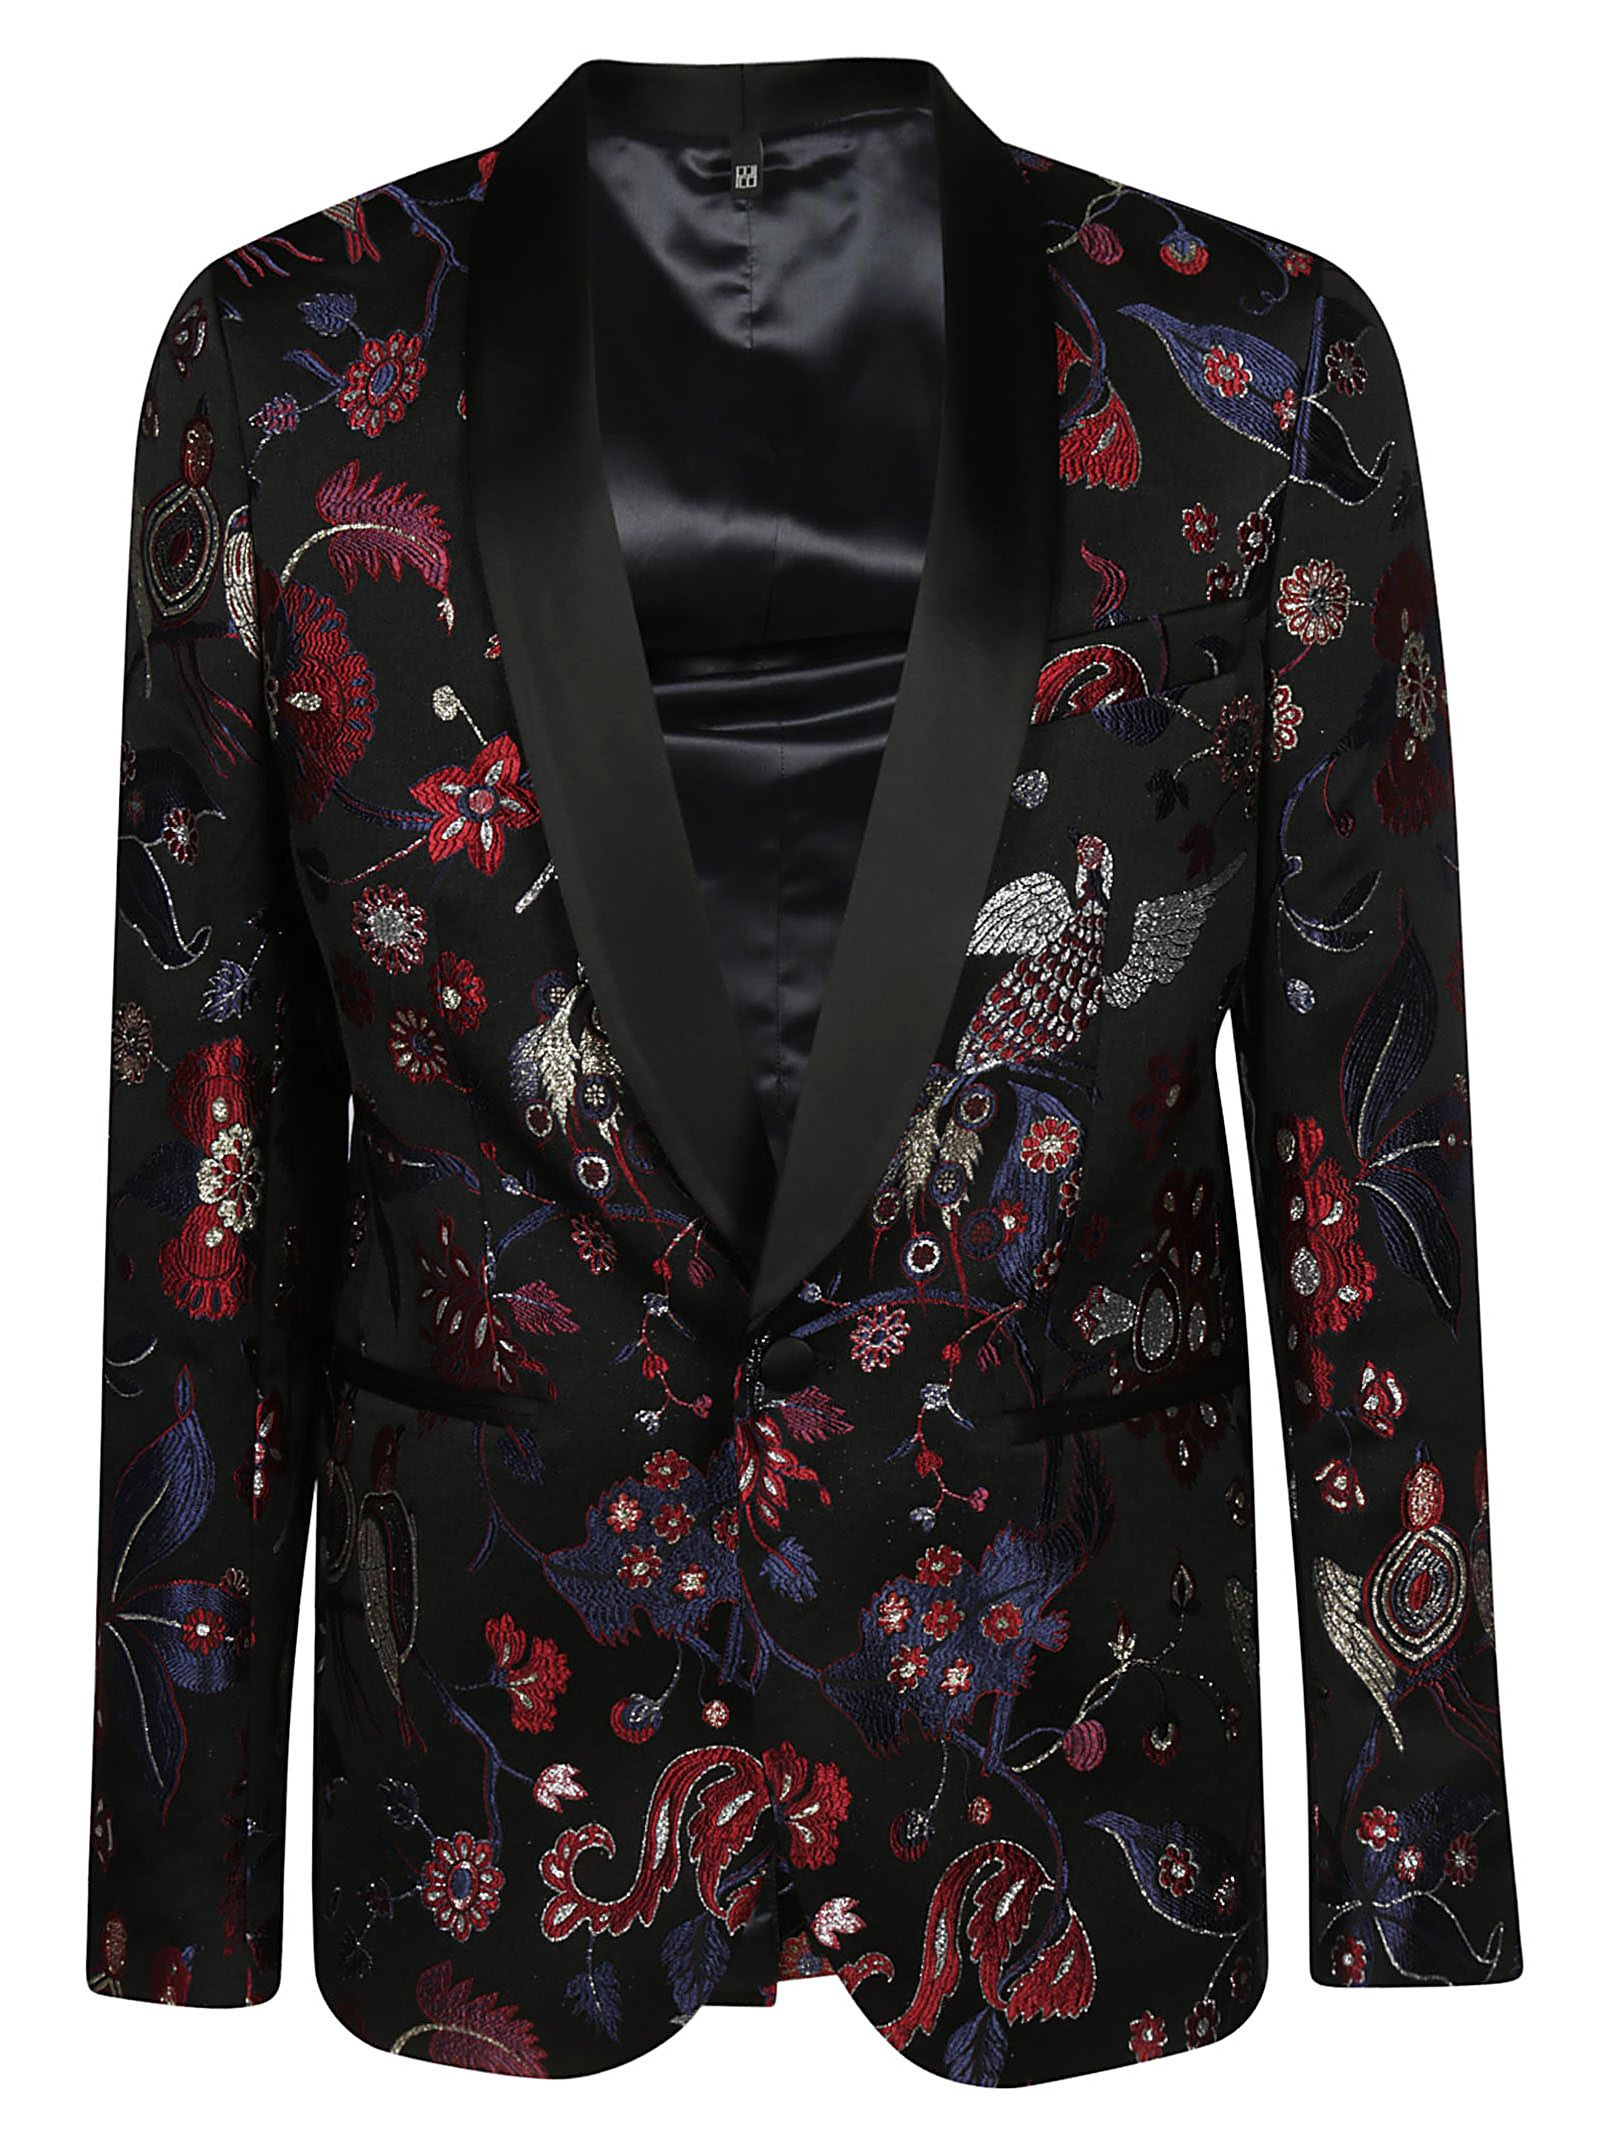 CHRISTIAN PELLIZZARI Single Breasted Smoking Jacket in Black